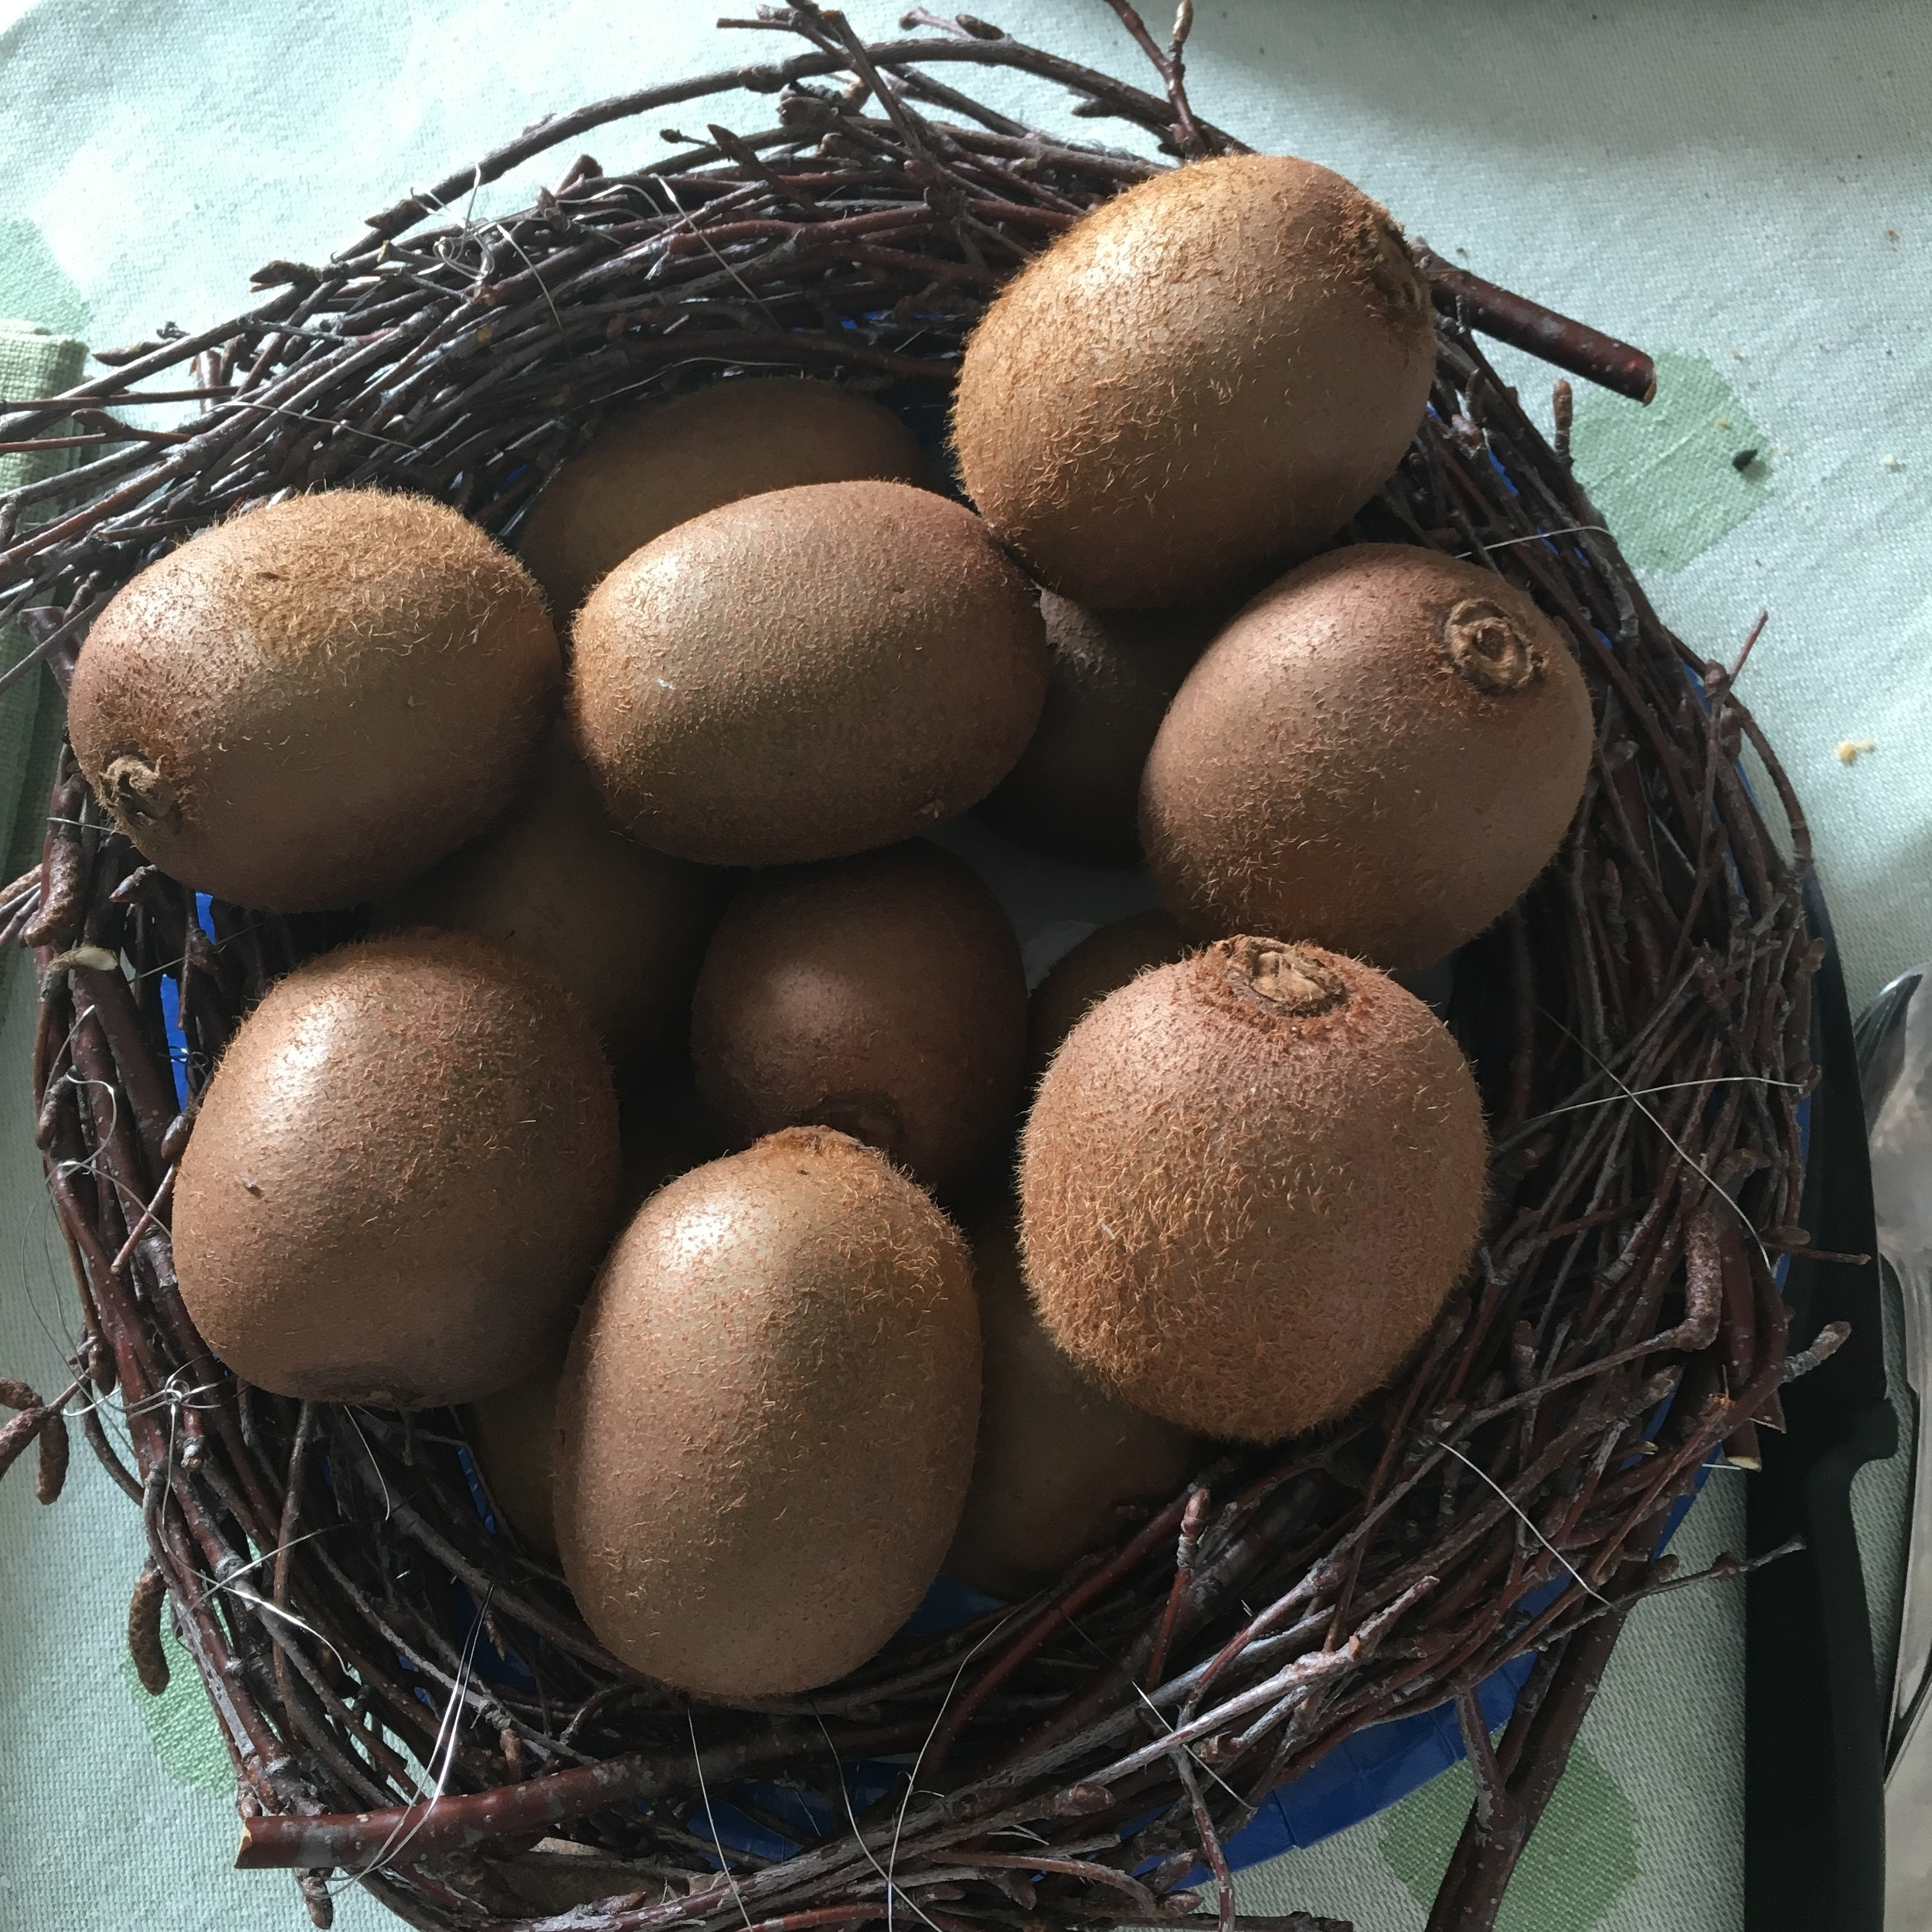 My creative mum did a kiwi bird nest